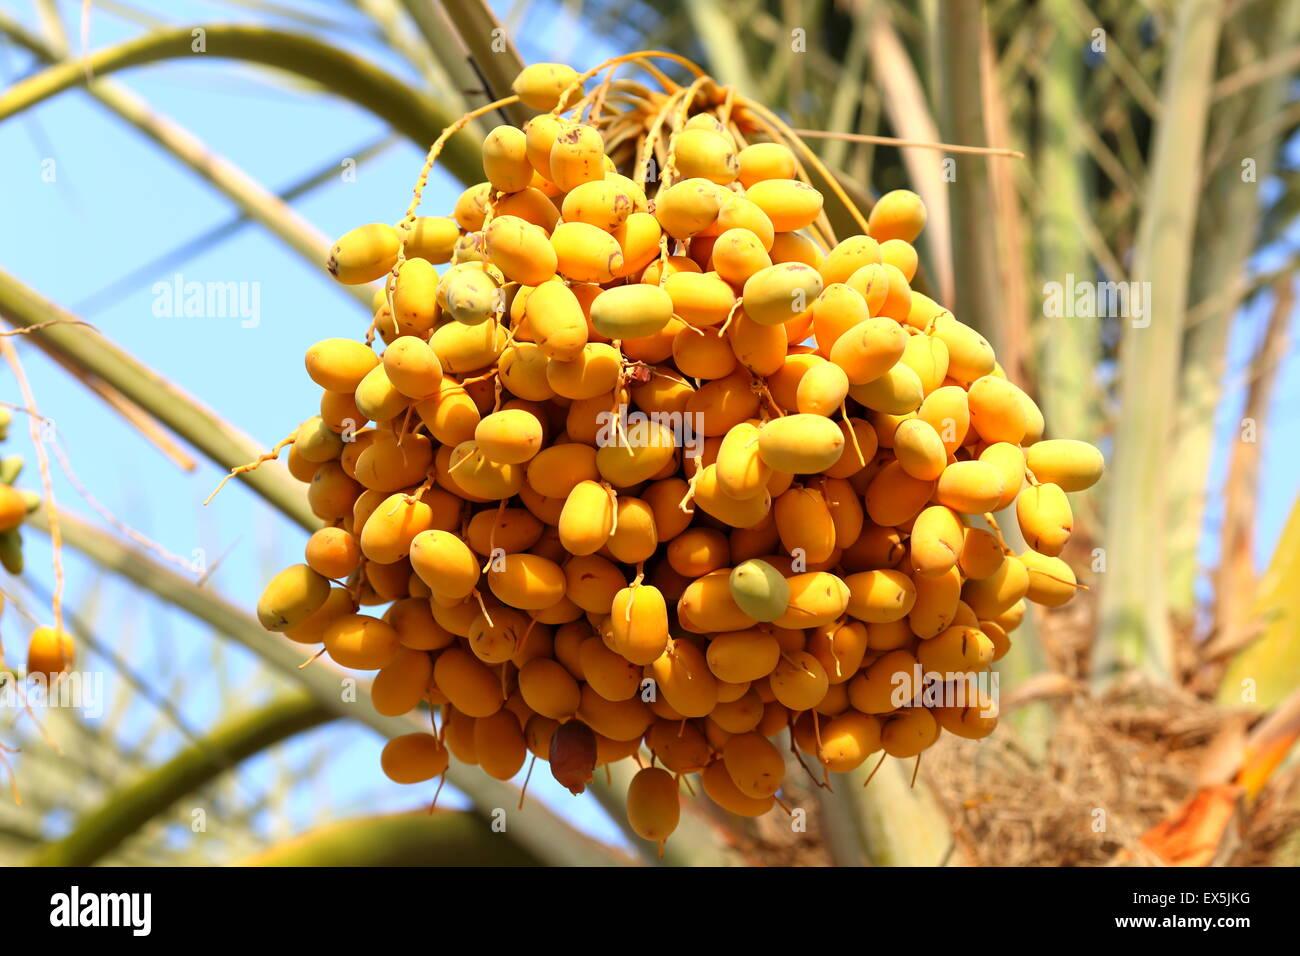 Fechas maduros, Al Markh, Reino de Bahrein Imagen De Stock